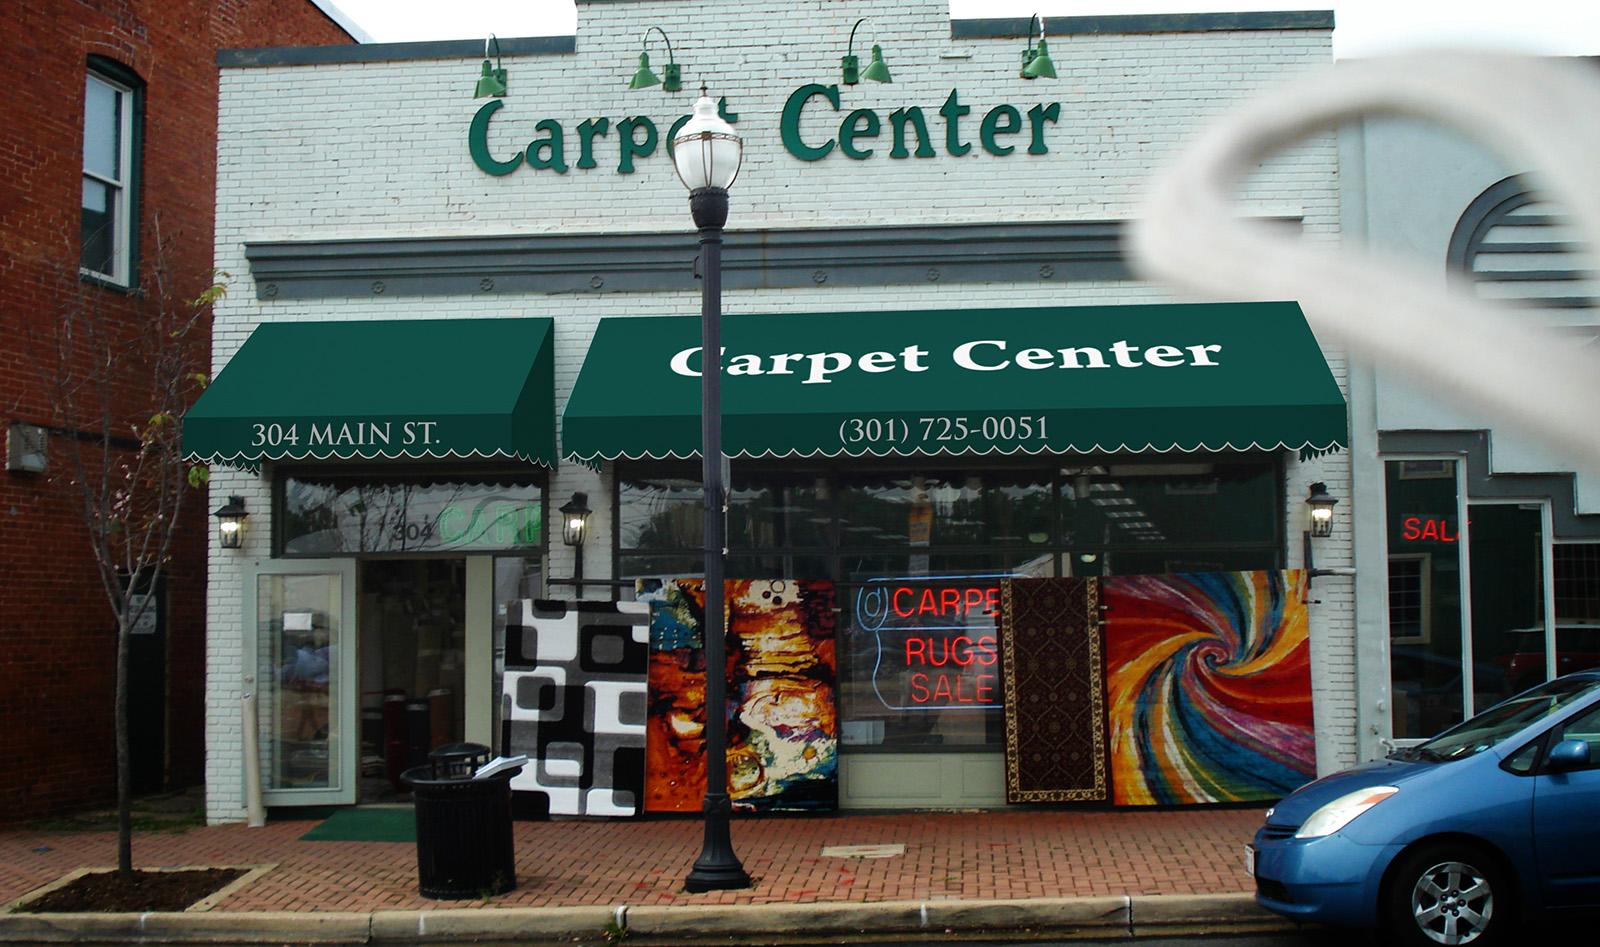 Carpet Center Digital Rendering